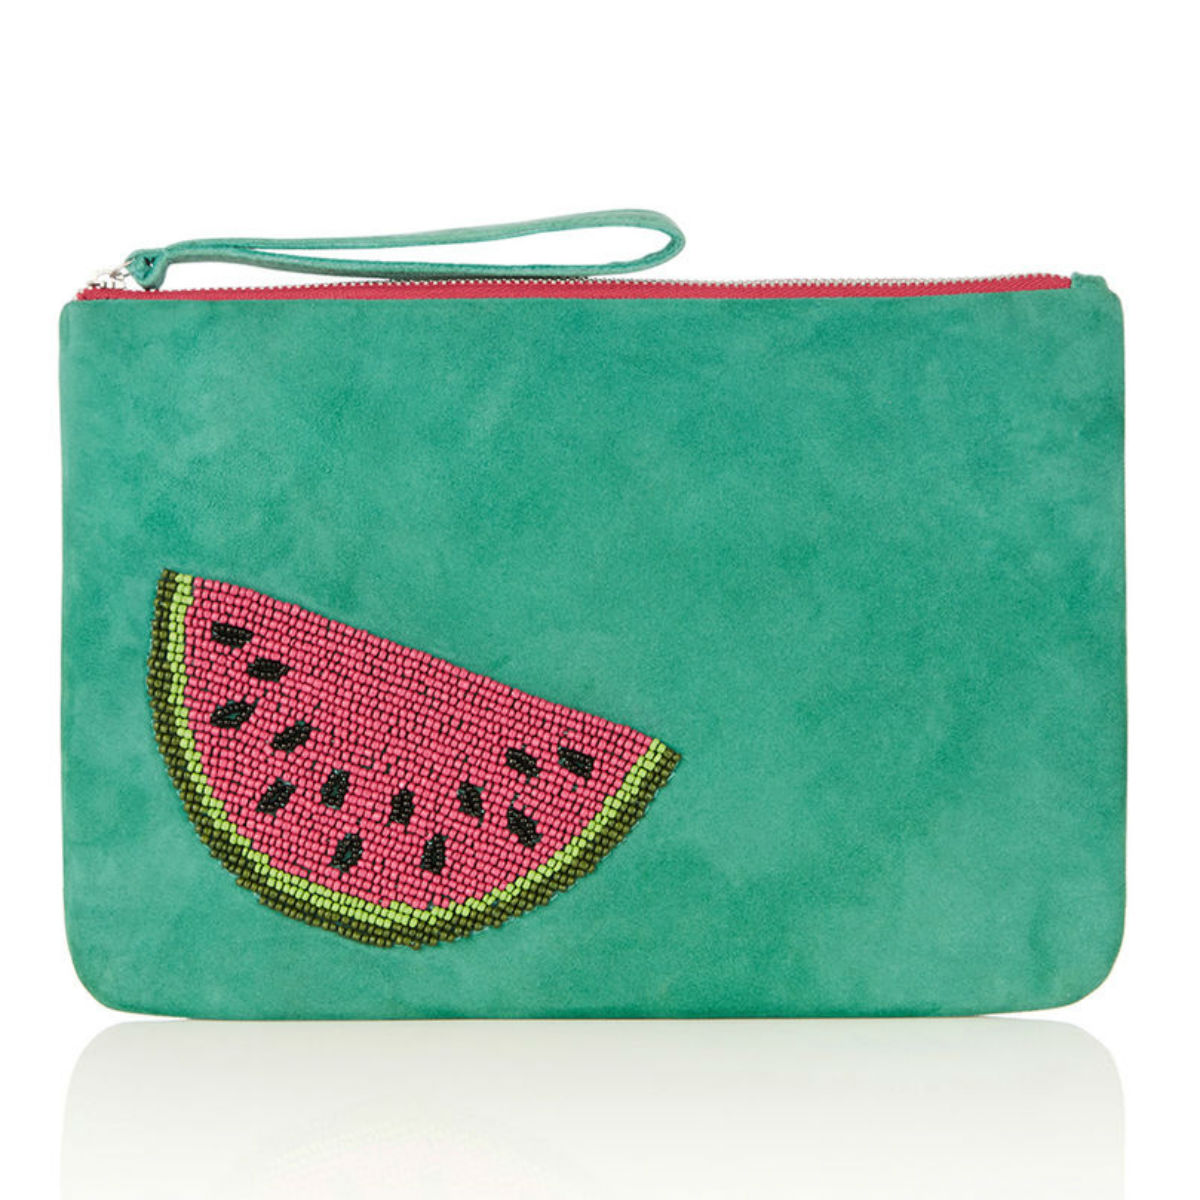 Watermelon clutch, £38, Oasis